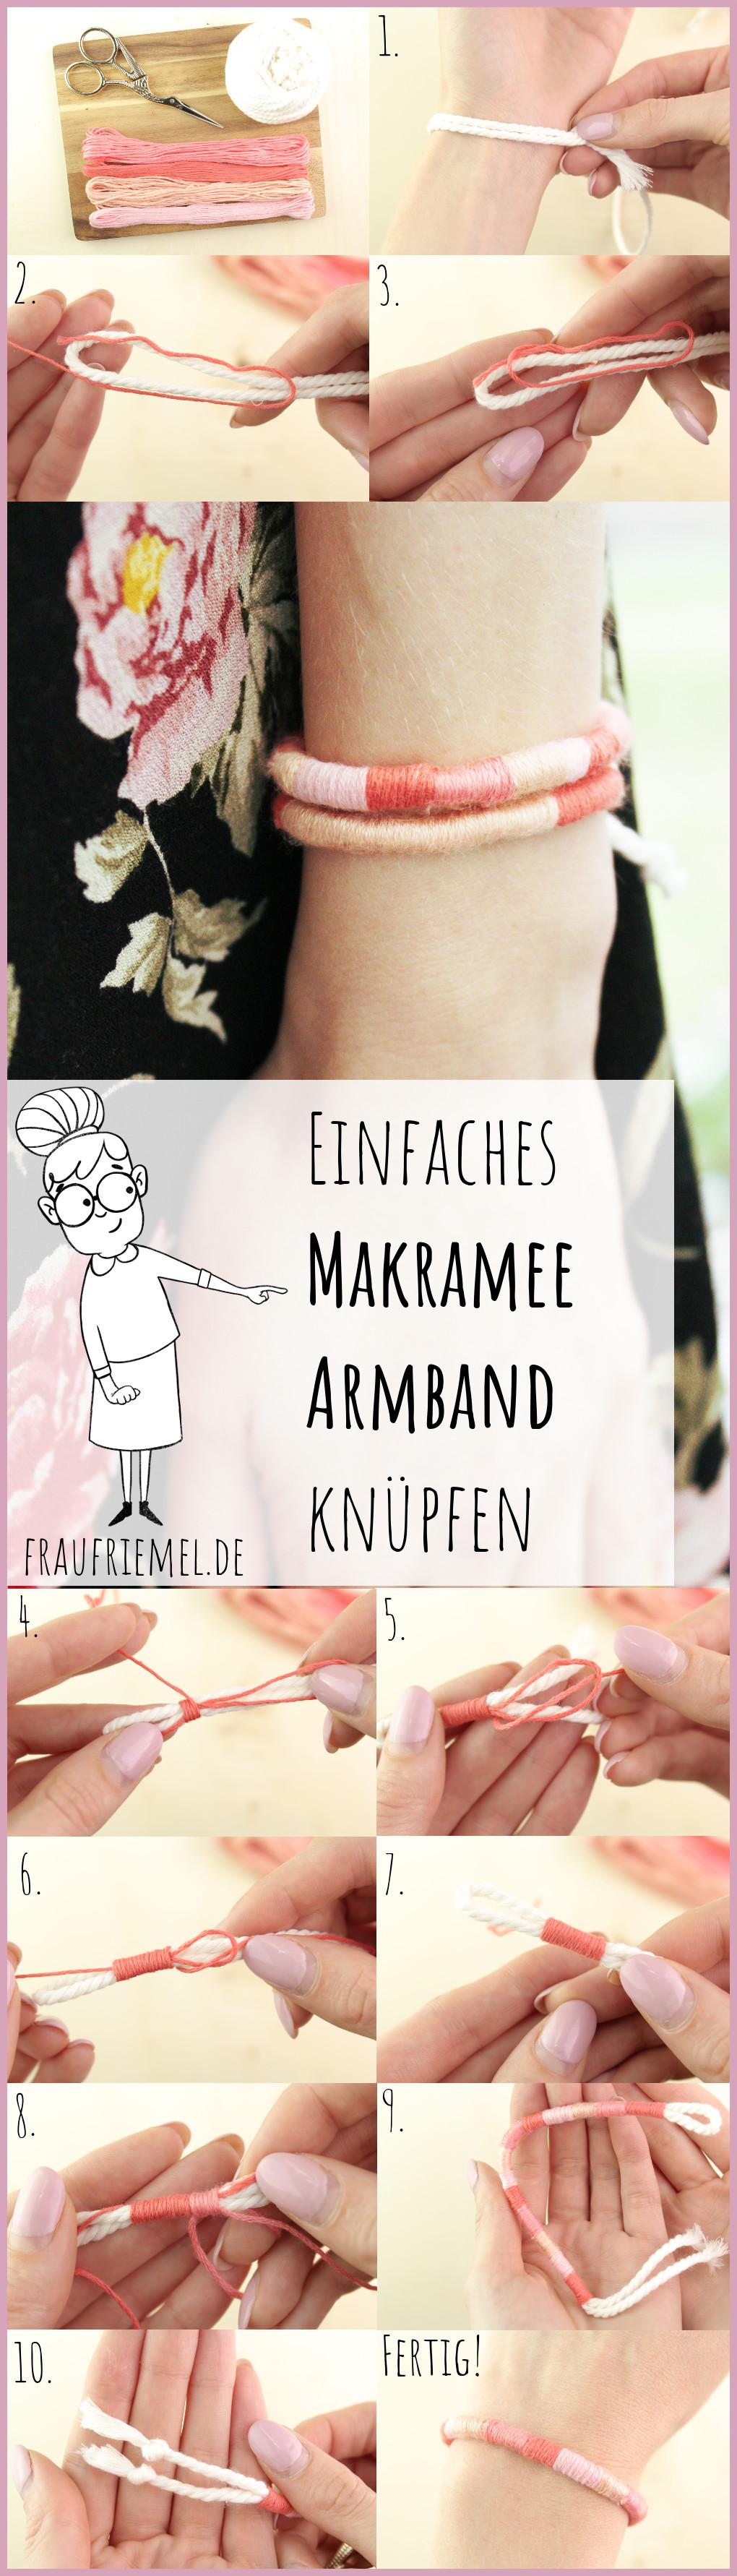 DIY Anleitung - Einfaches Makramee Armband knüpfen